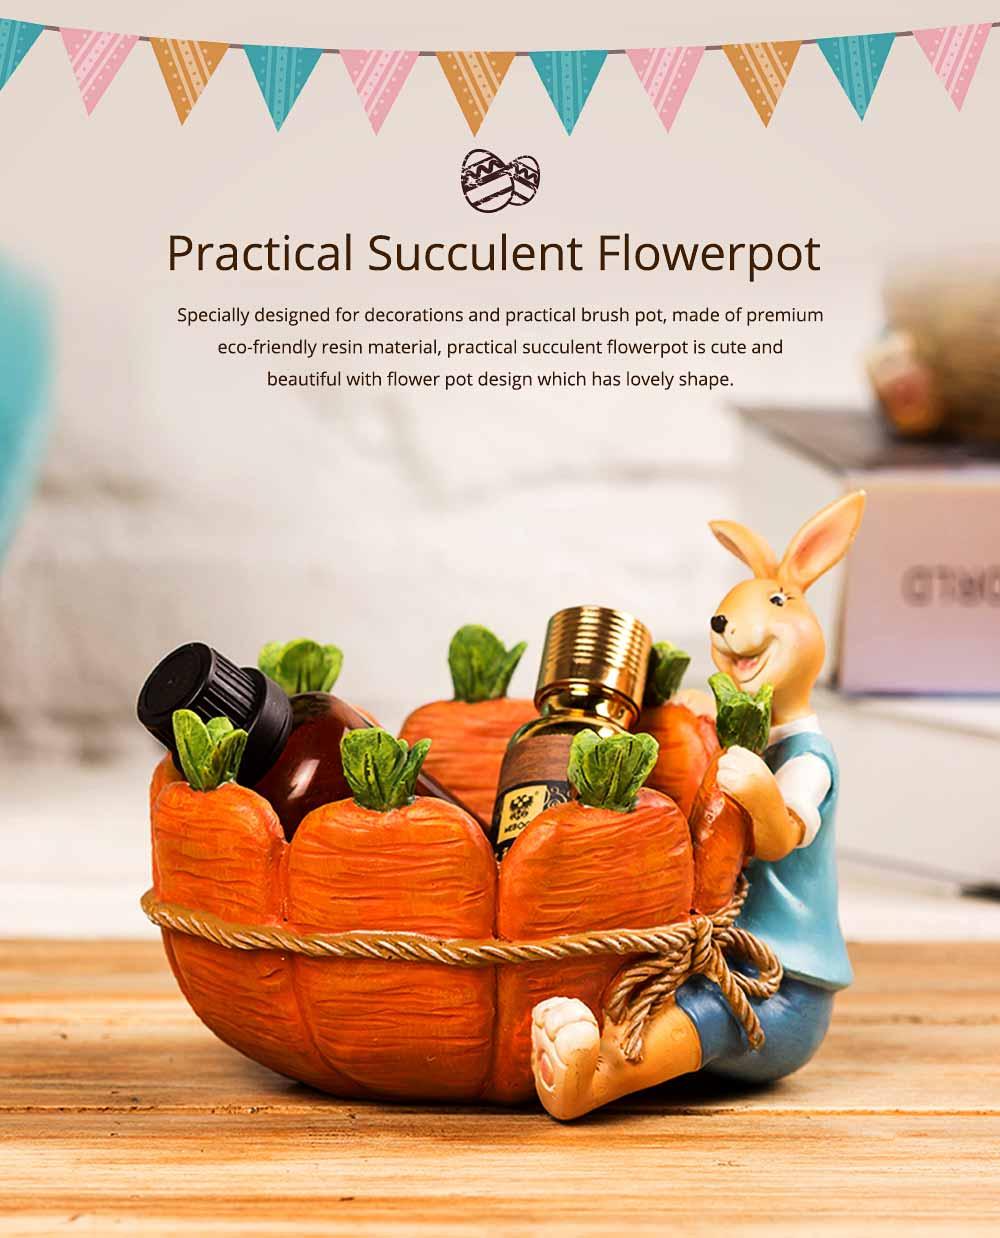 Succulent Flower pot, Lovely Cartoon Rabbit with Flower Pot Design for Birthday or Easter Present 0